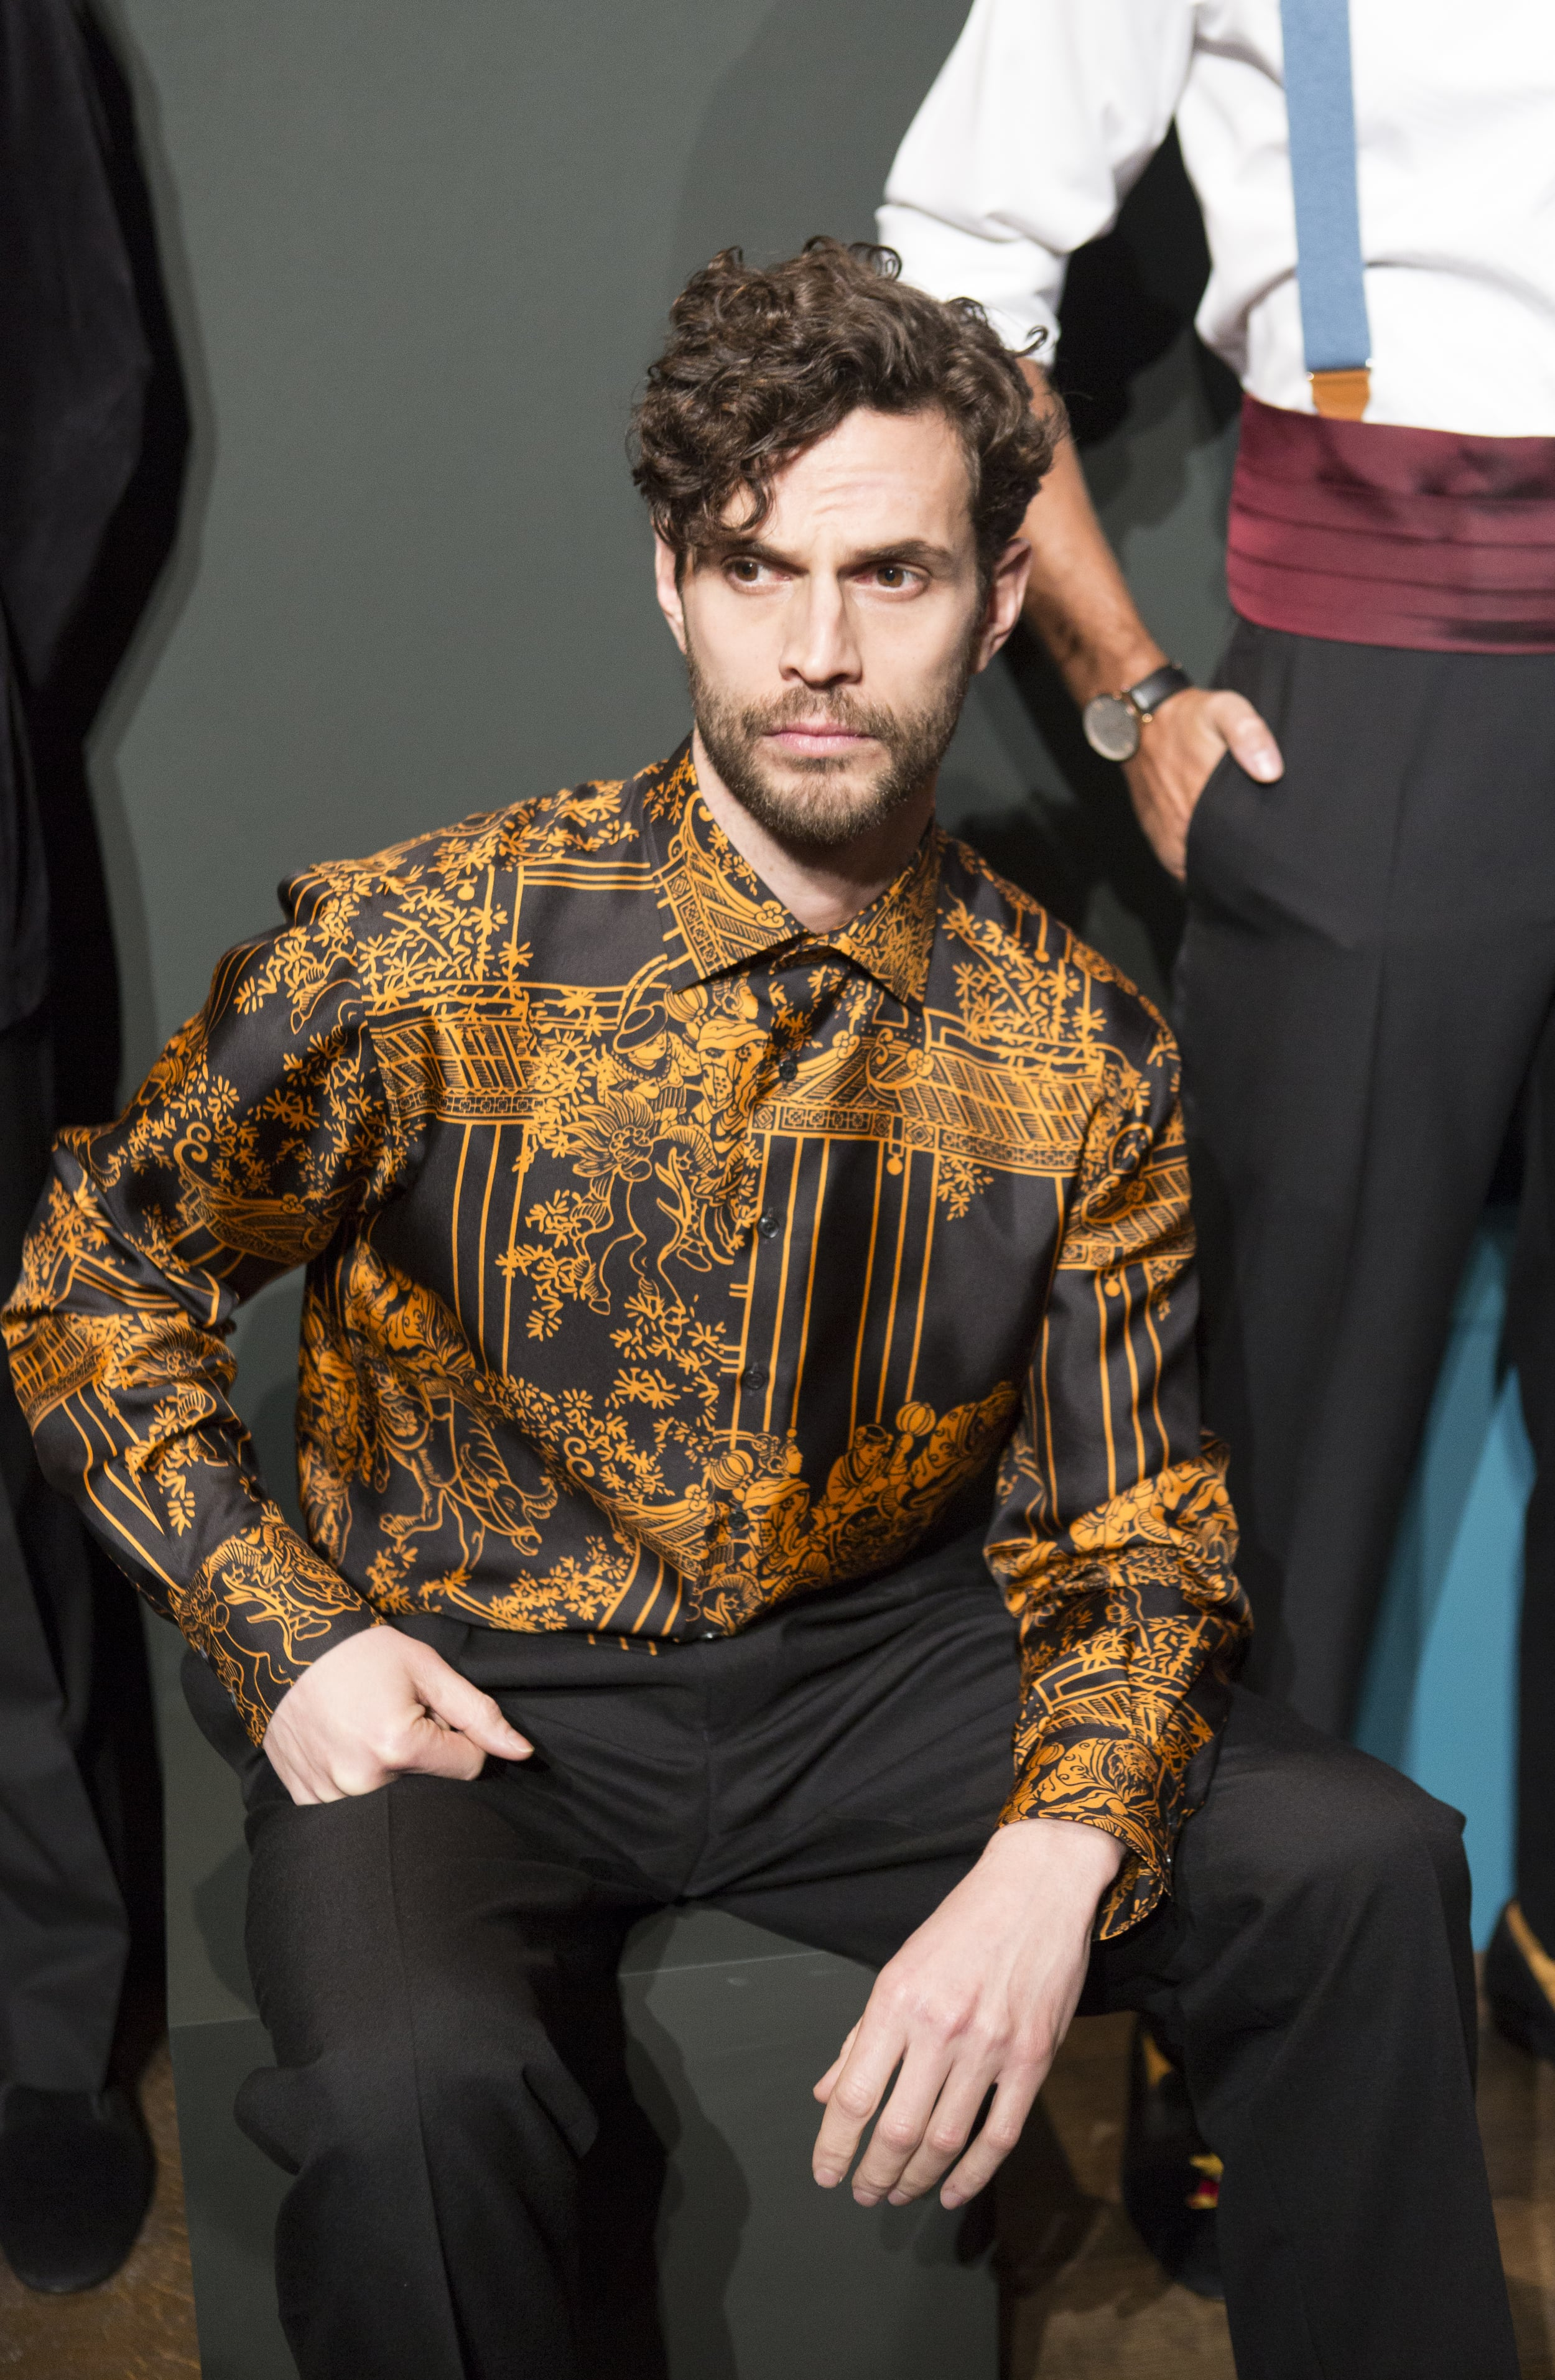 Thomas Pink - renown shirt maker